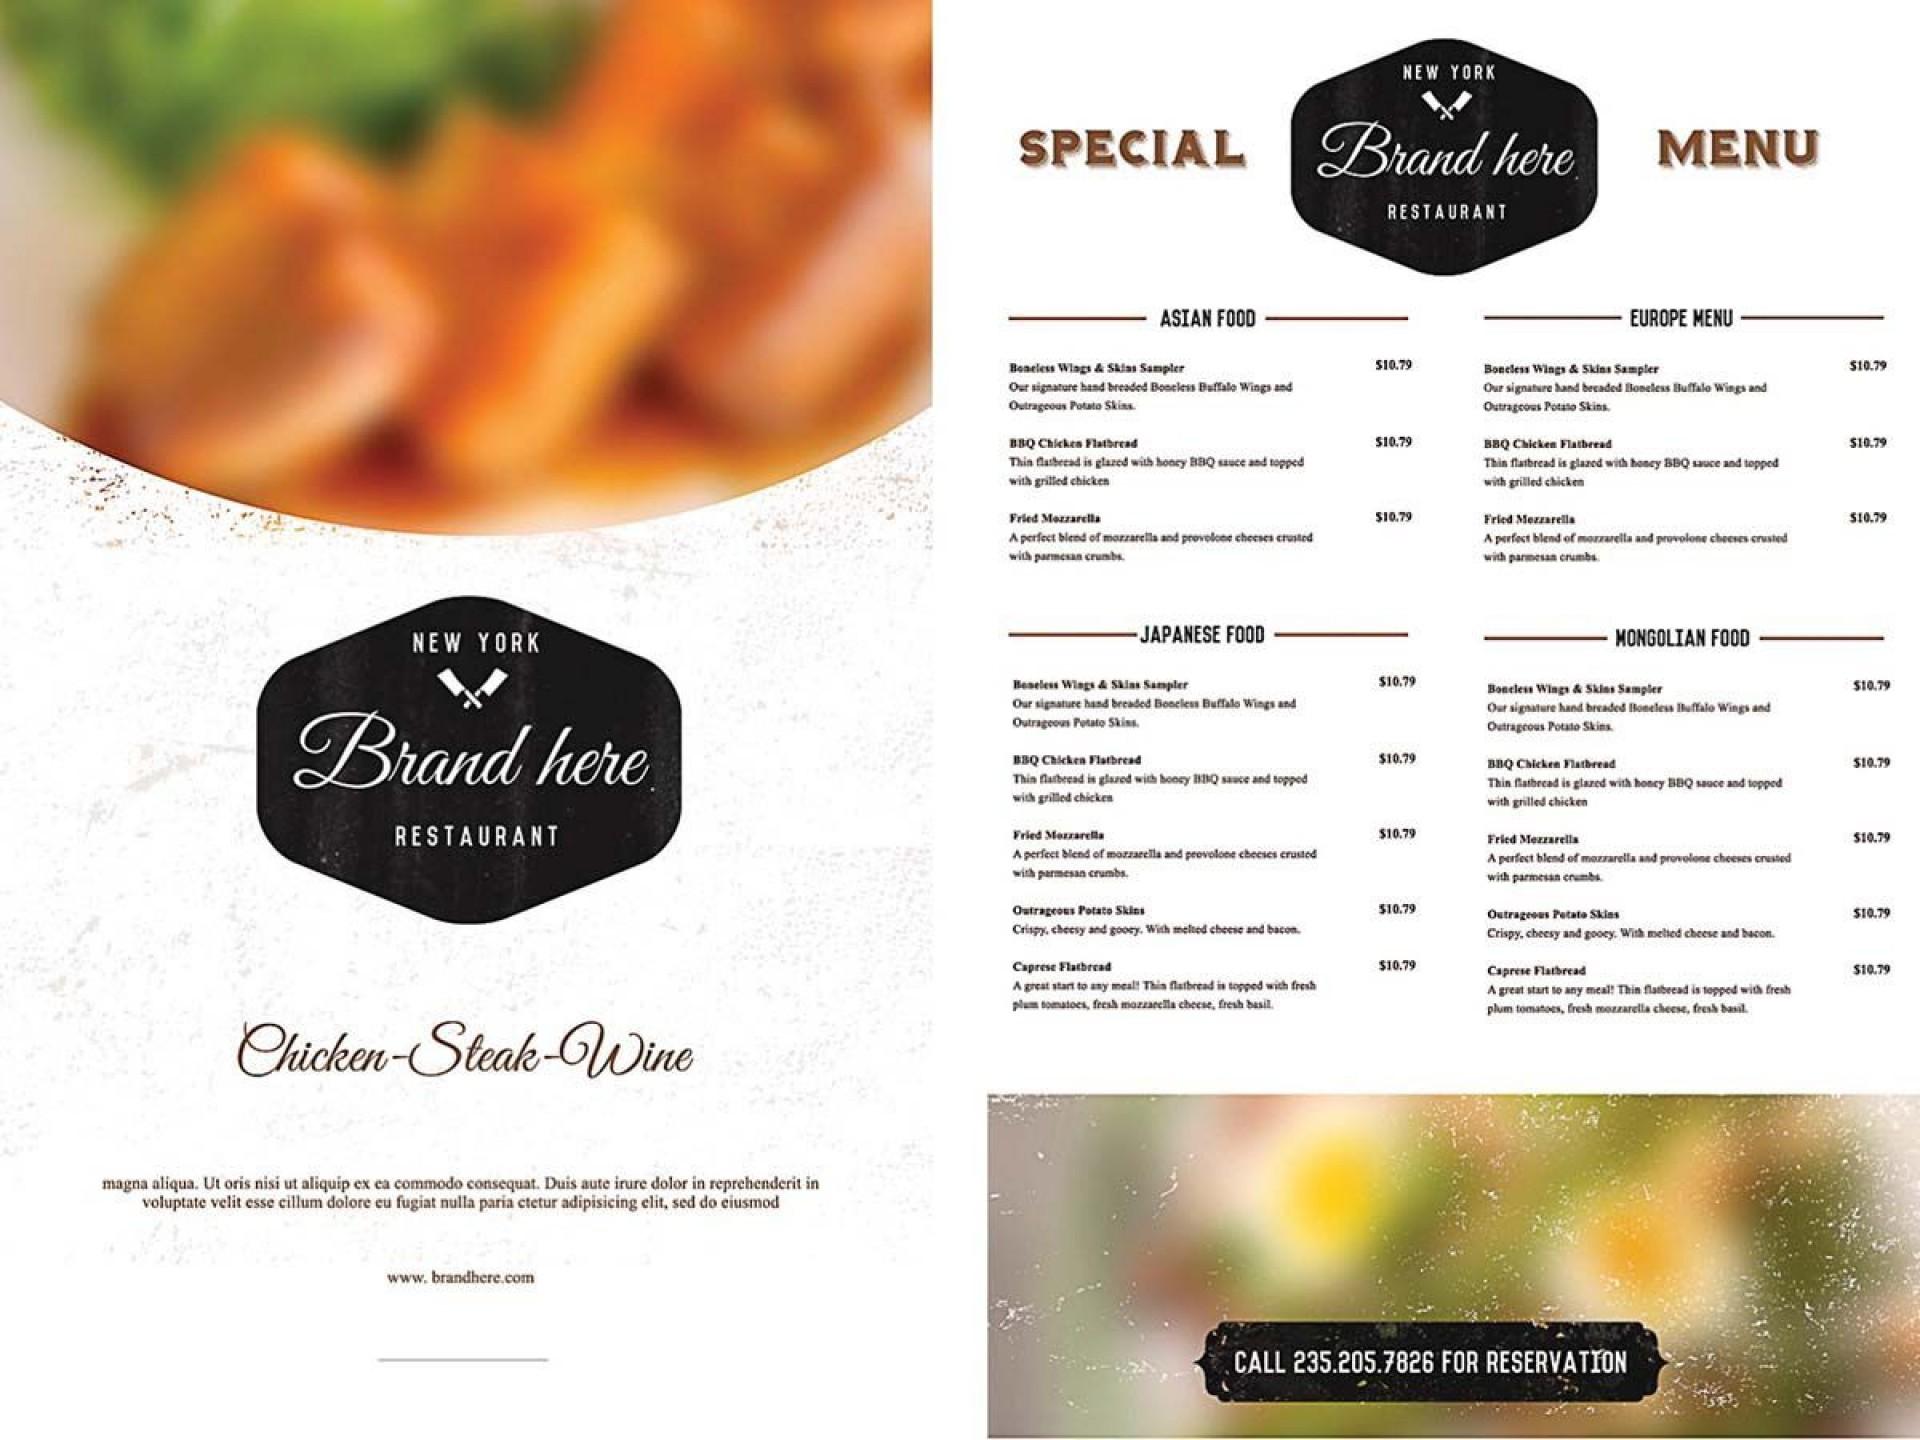 009 Wonderful Restaurant Menu Template Free Download Highest Quality 1920